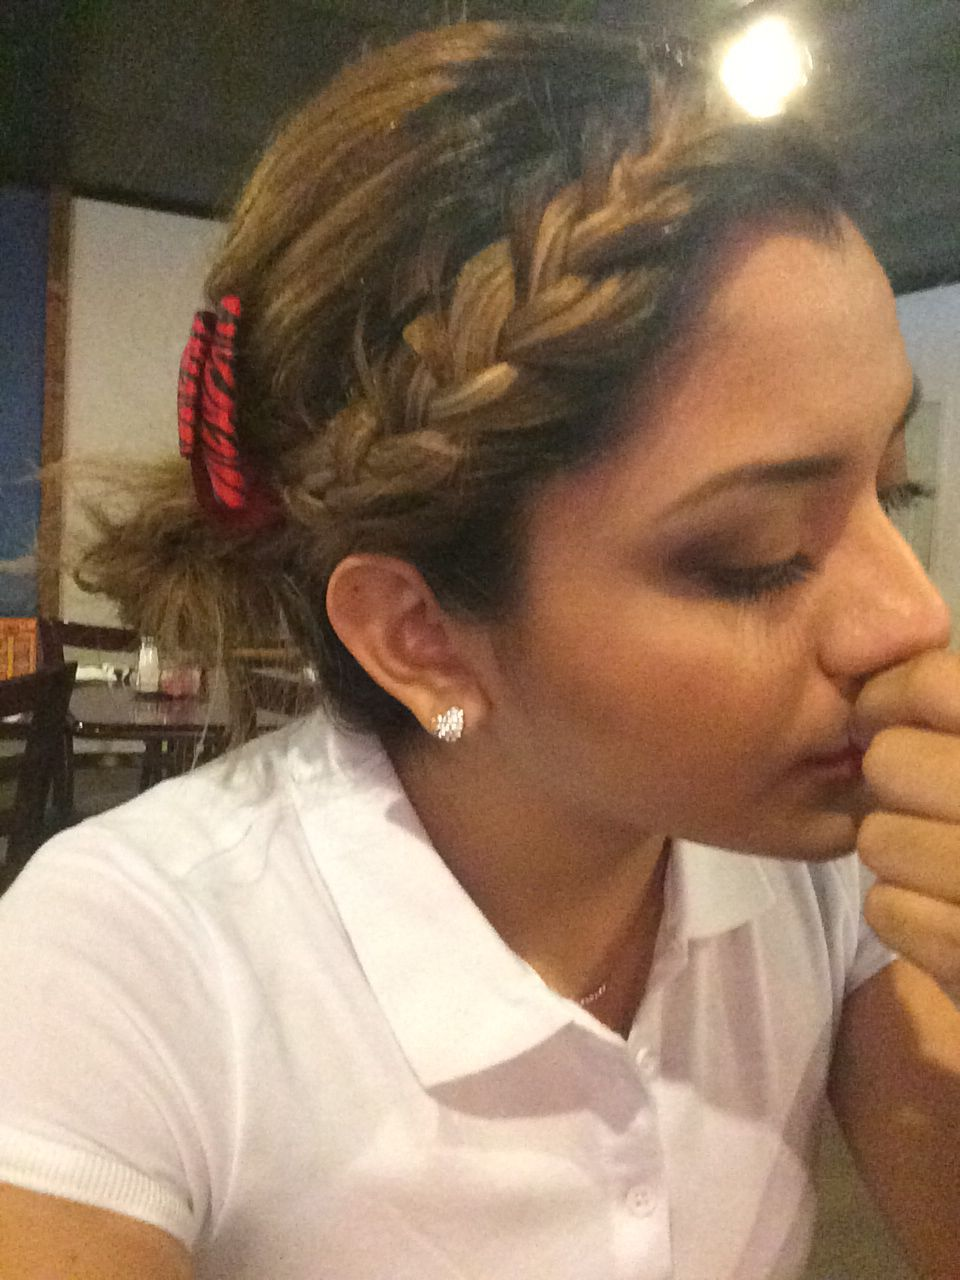 waitress hairstyles | hair in 2019 | waitress hairstyles